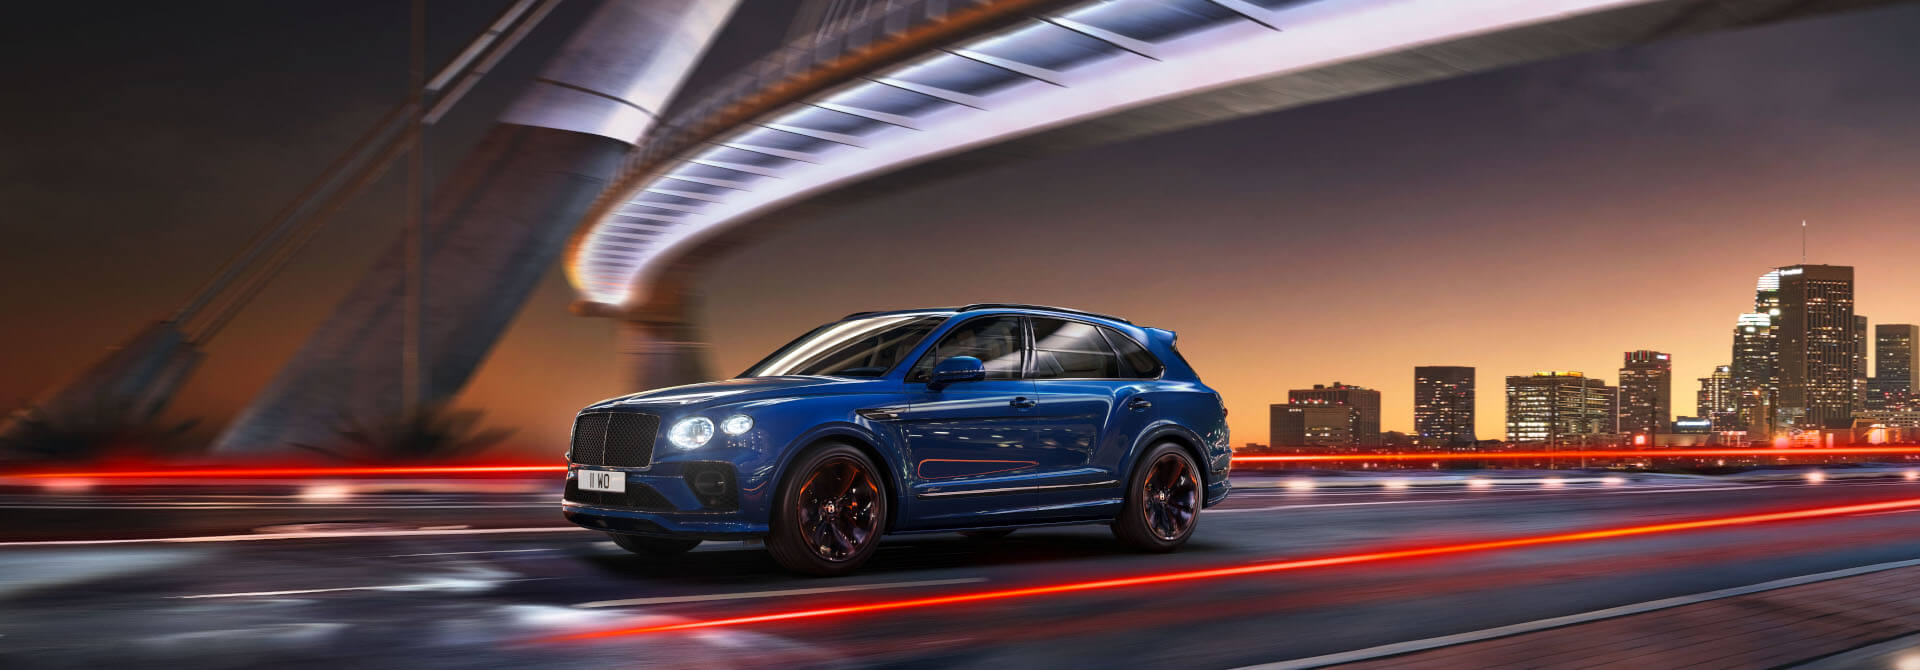 New Bentley Bentayga Speed New Bentayga Bentley Motors